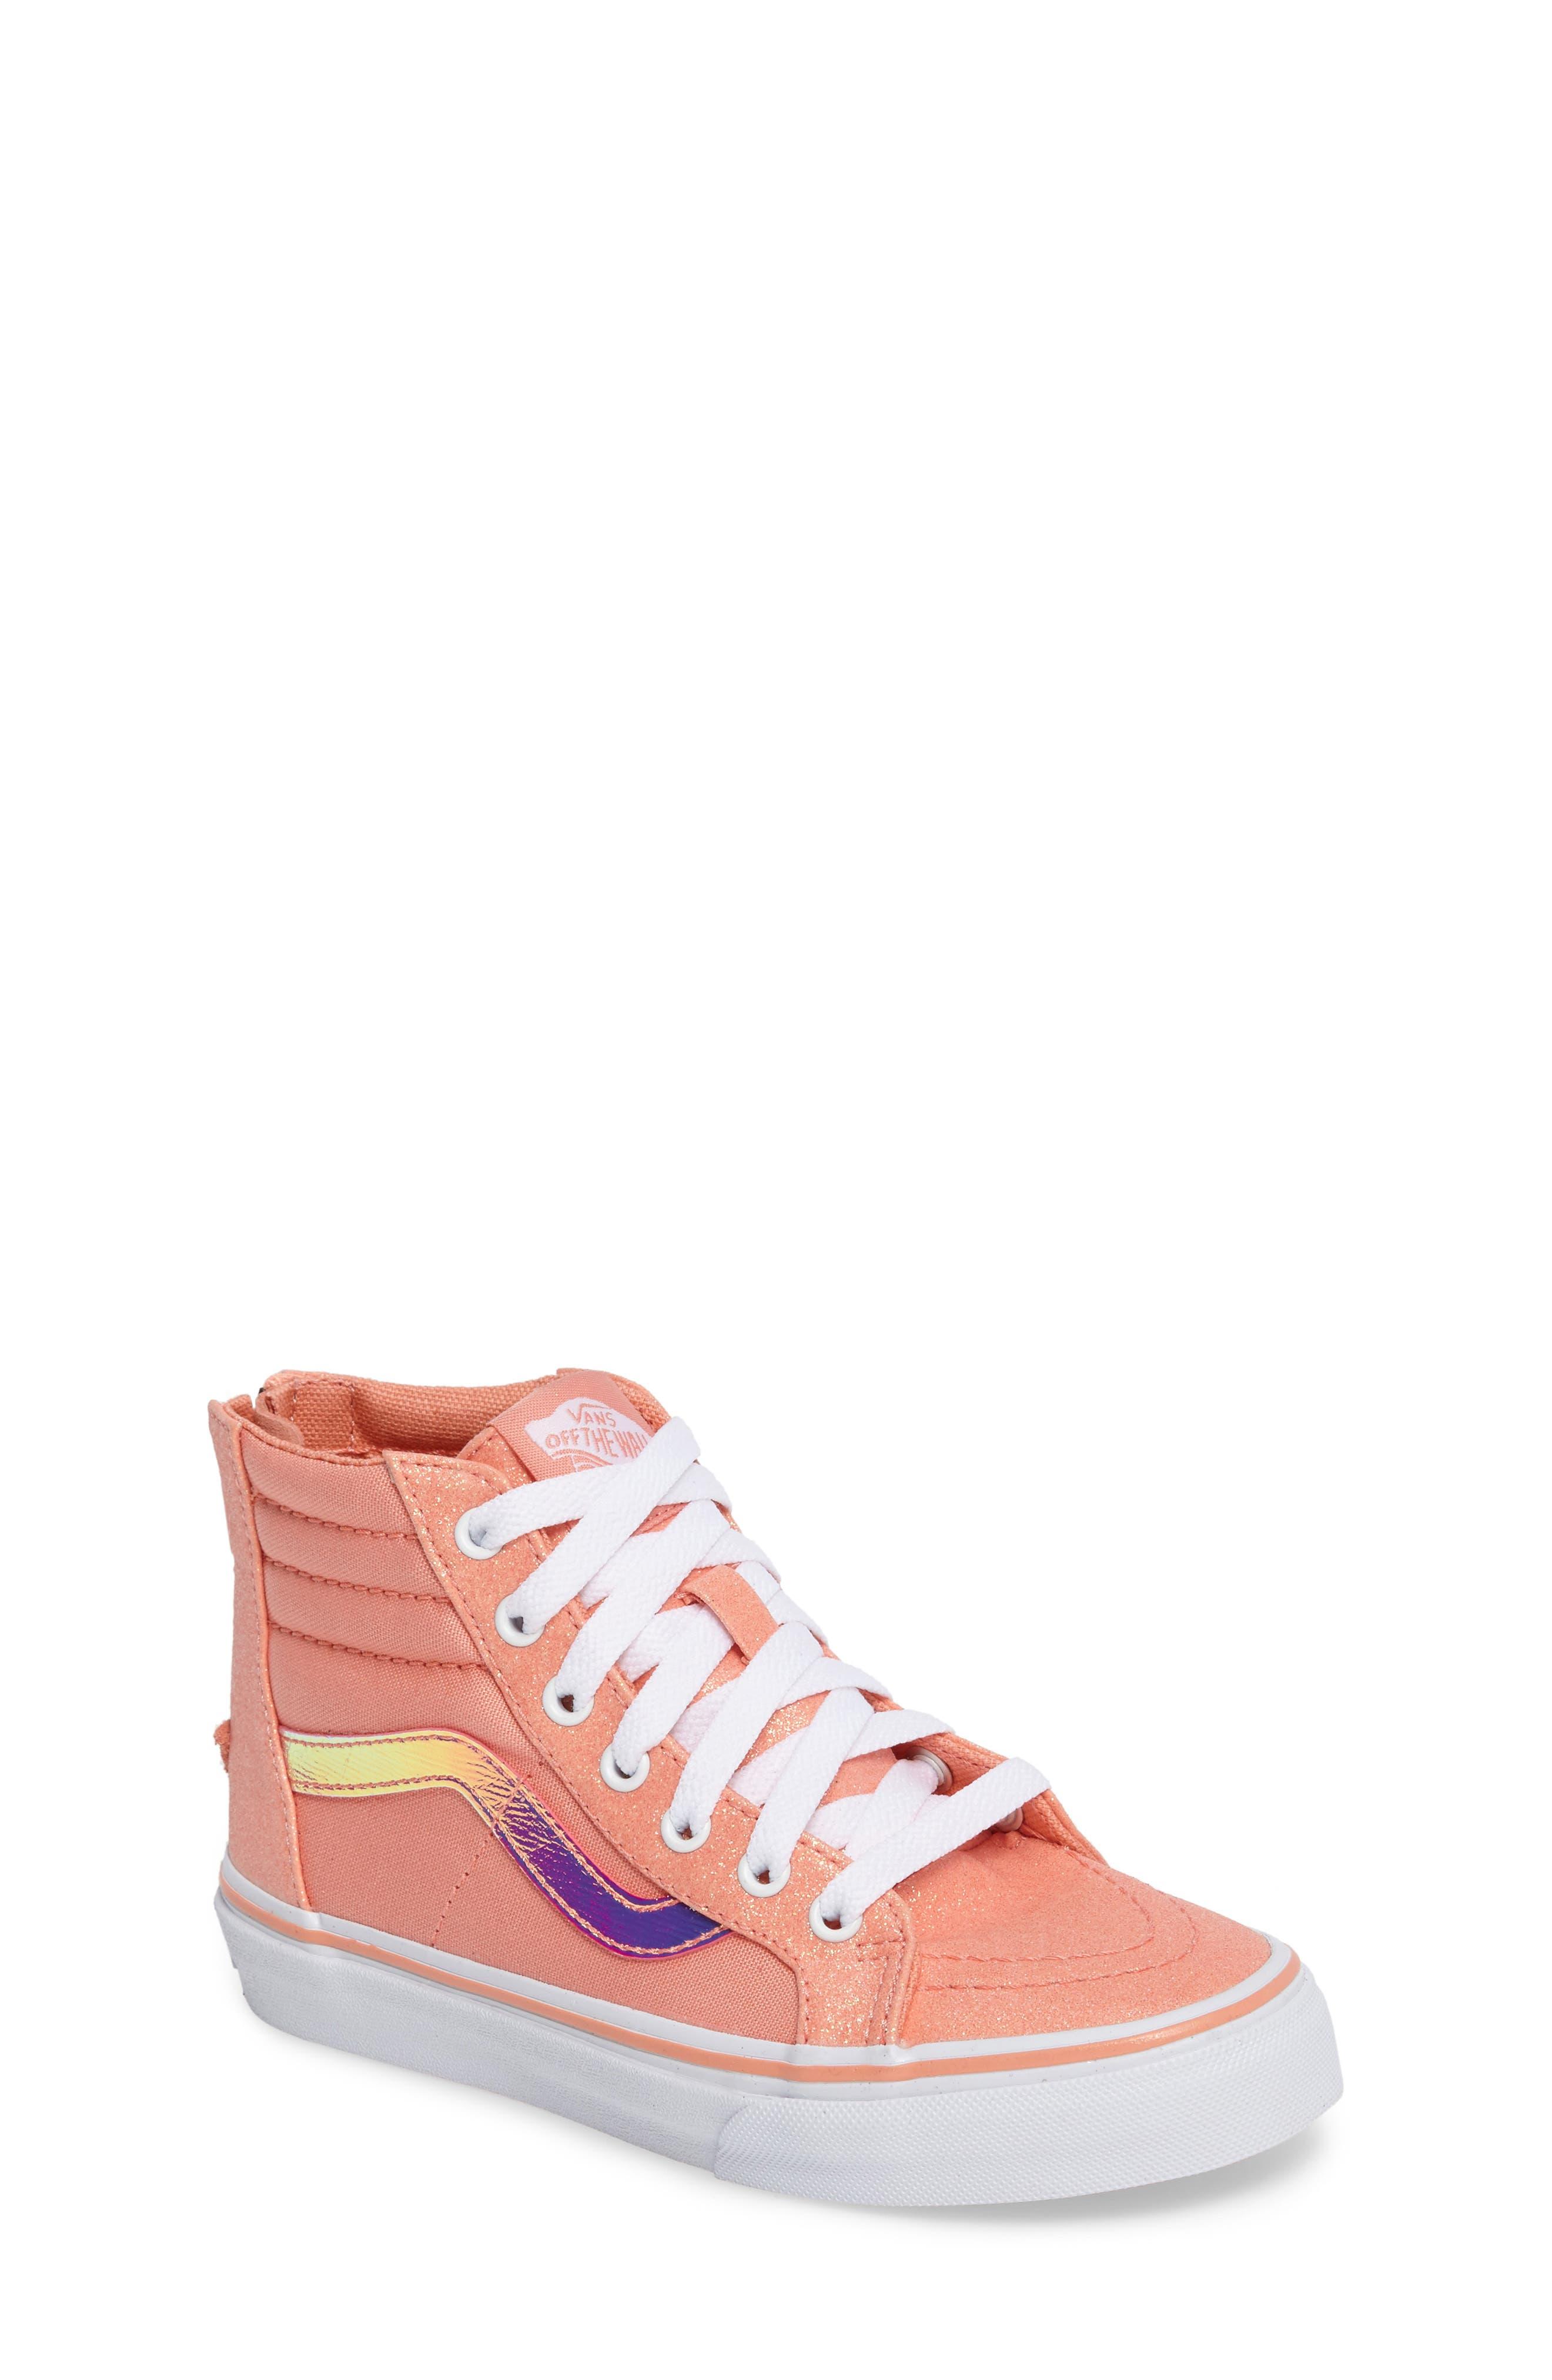 Sk8-Hi Zip Sneaker,                         Main,                         color, Coral Glitter/ Iridescent